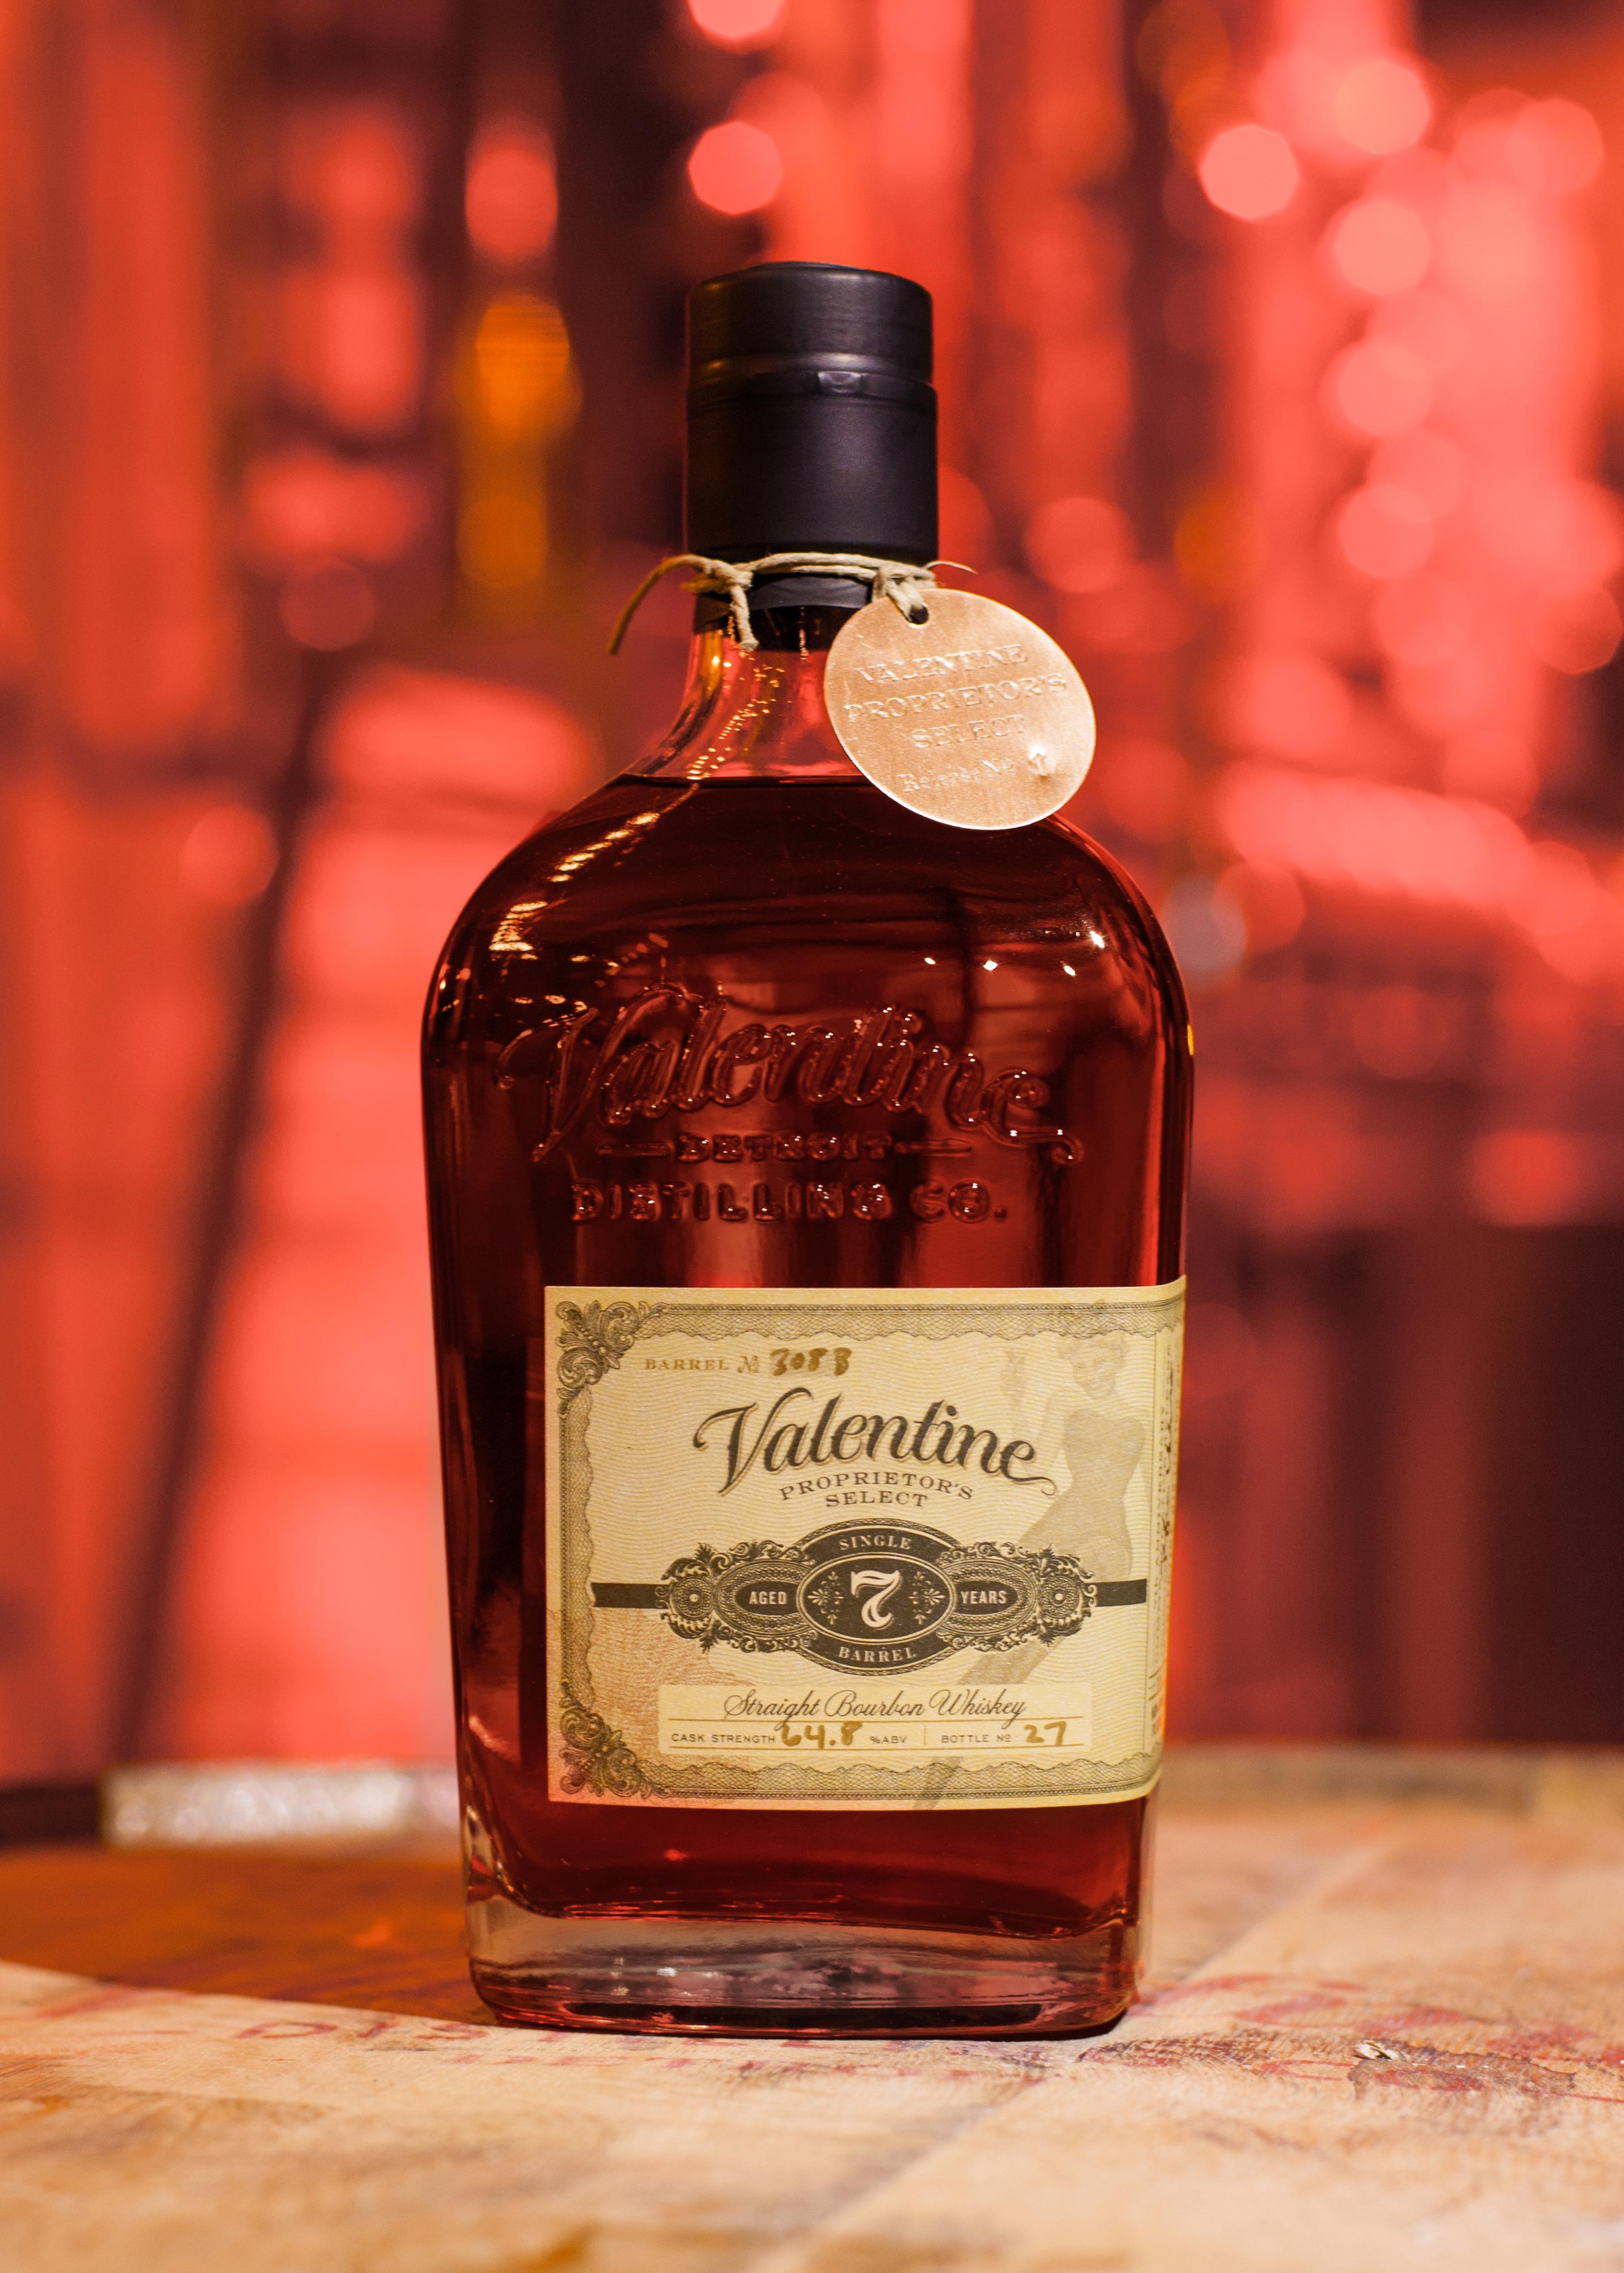 Valentine Distilling Introduces Proprietors Select Series